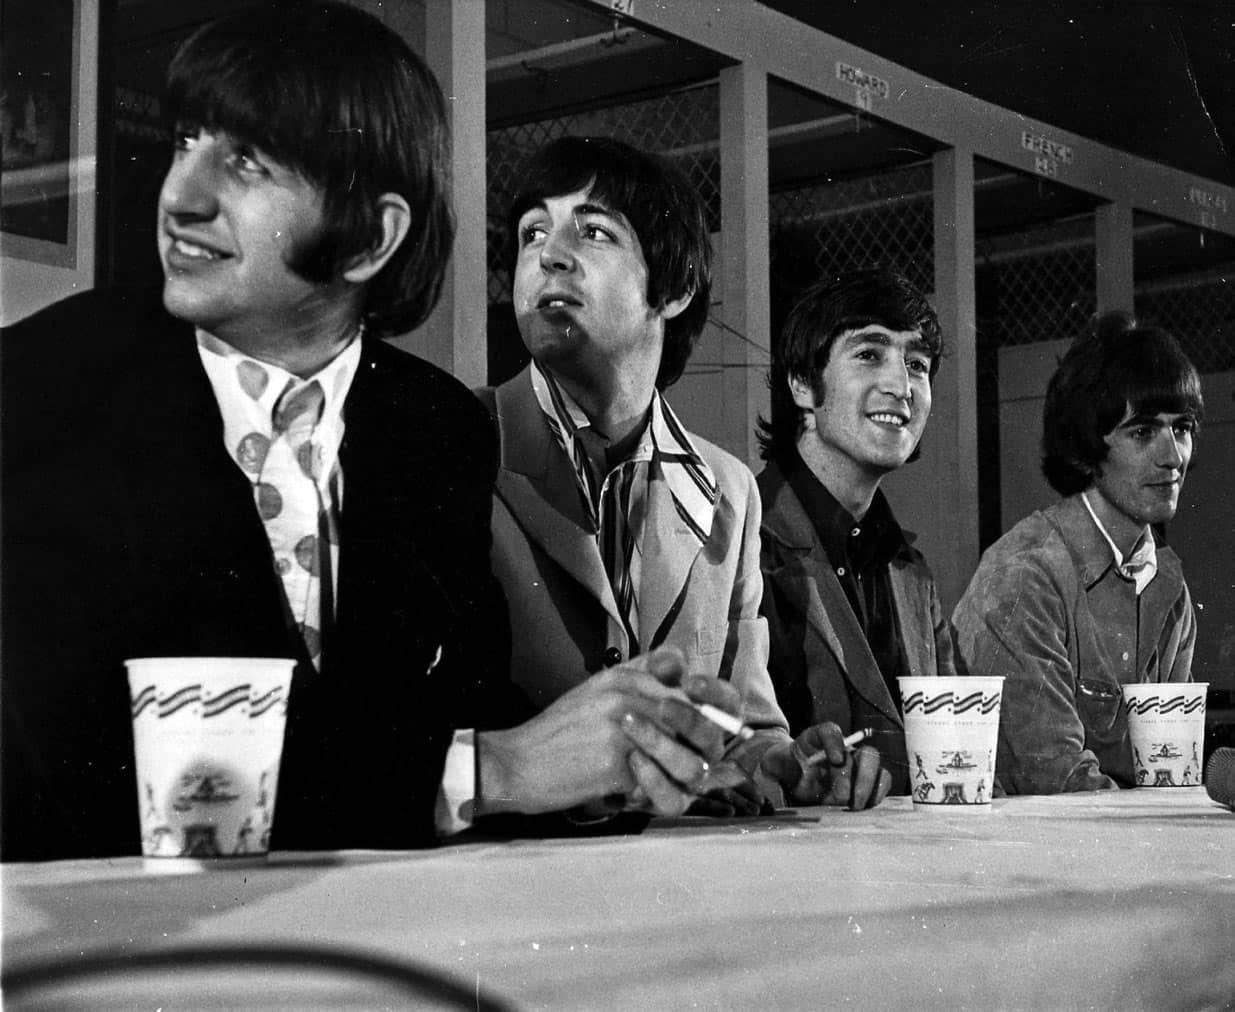 #cute#the beatles#beatles #rock and roll #john lennon#paul mccartney#George Harrison#ringo starr#rock music#rock#music#60s music#60s#classic rock #classic rock fandom #george#paul#john#ringo